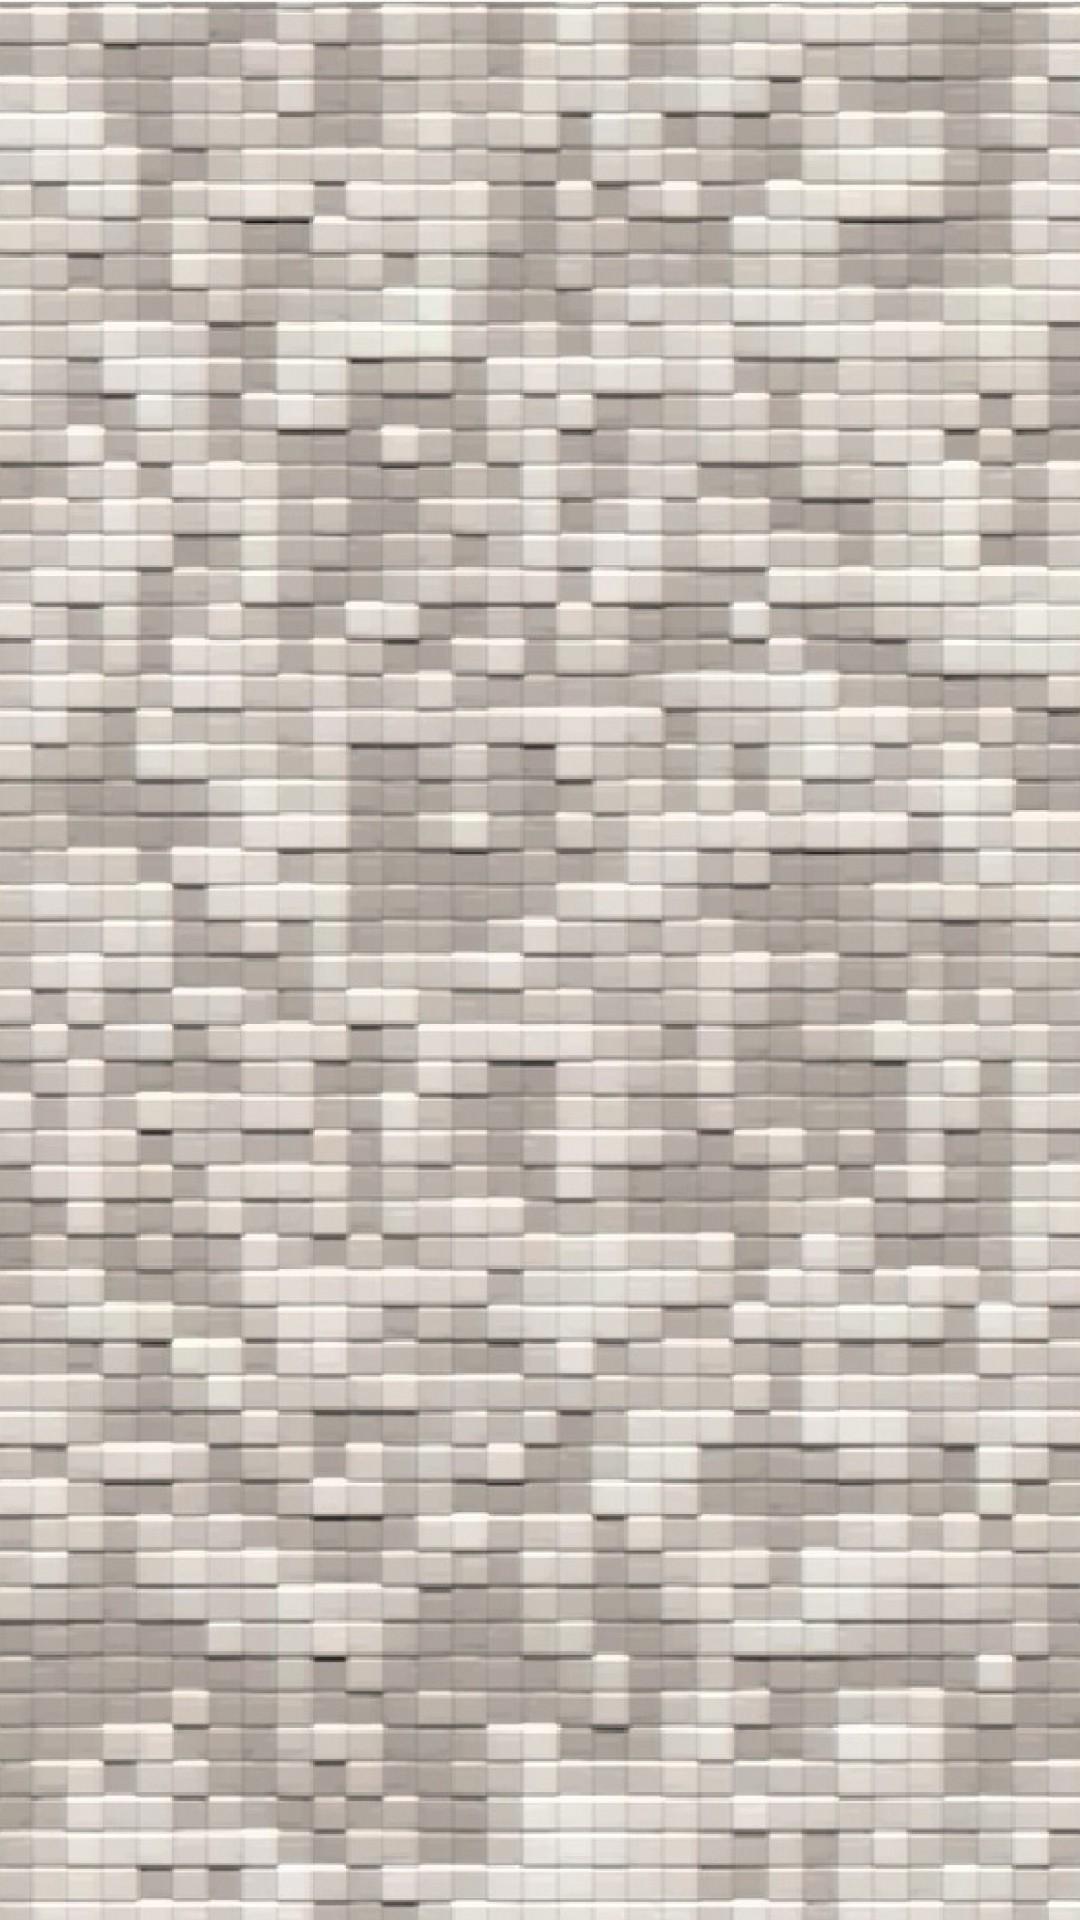 Wallpaper pixel, black, digital, camouflage